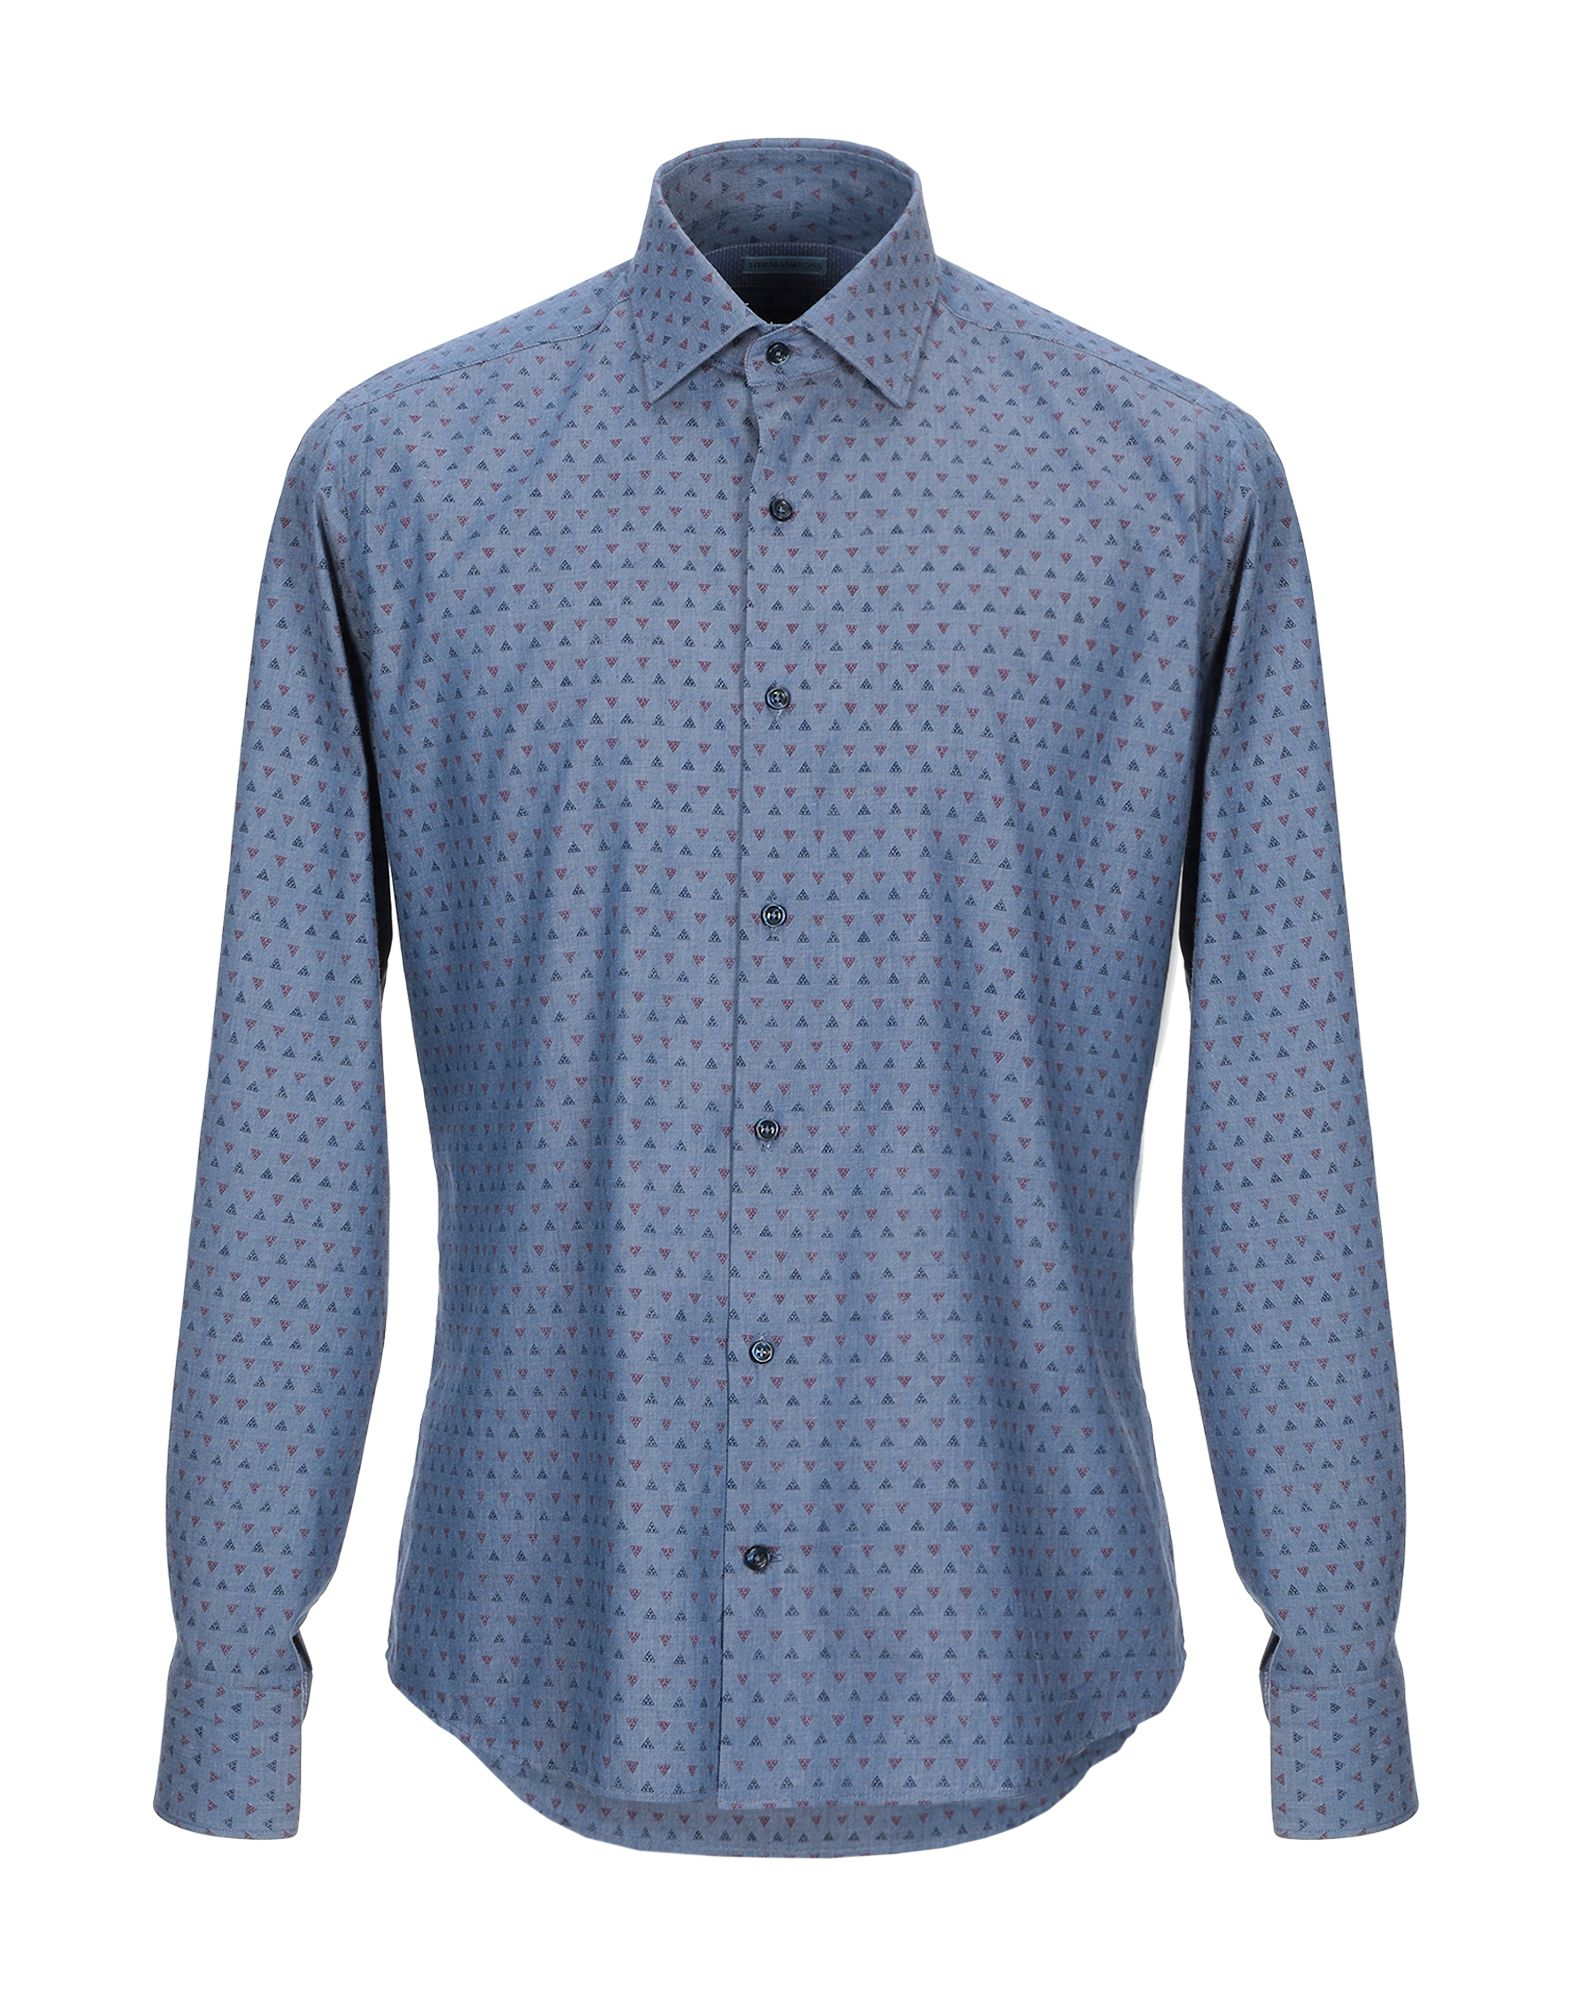 HENRY COTTON'S Джинсовая рубашка цена